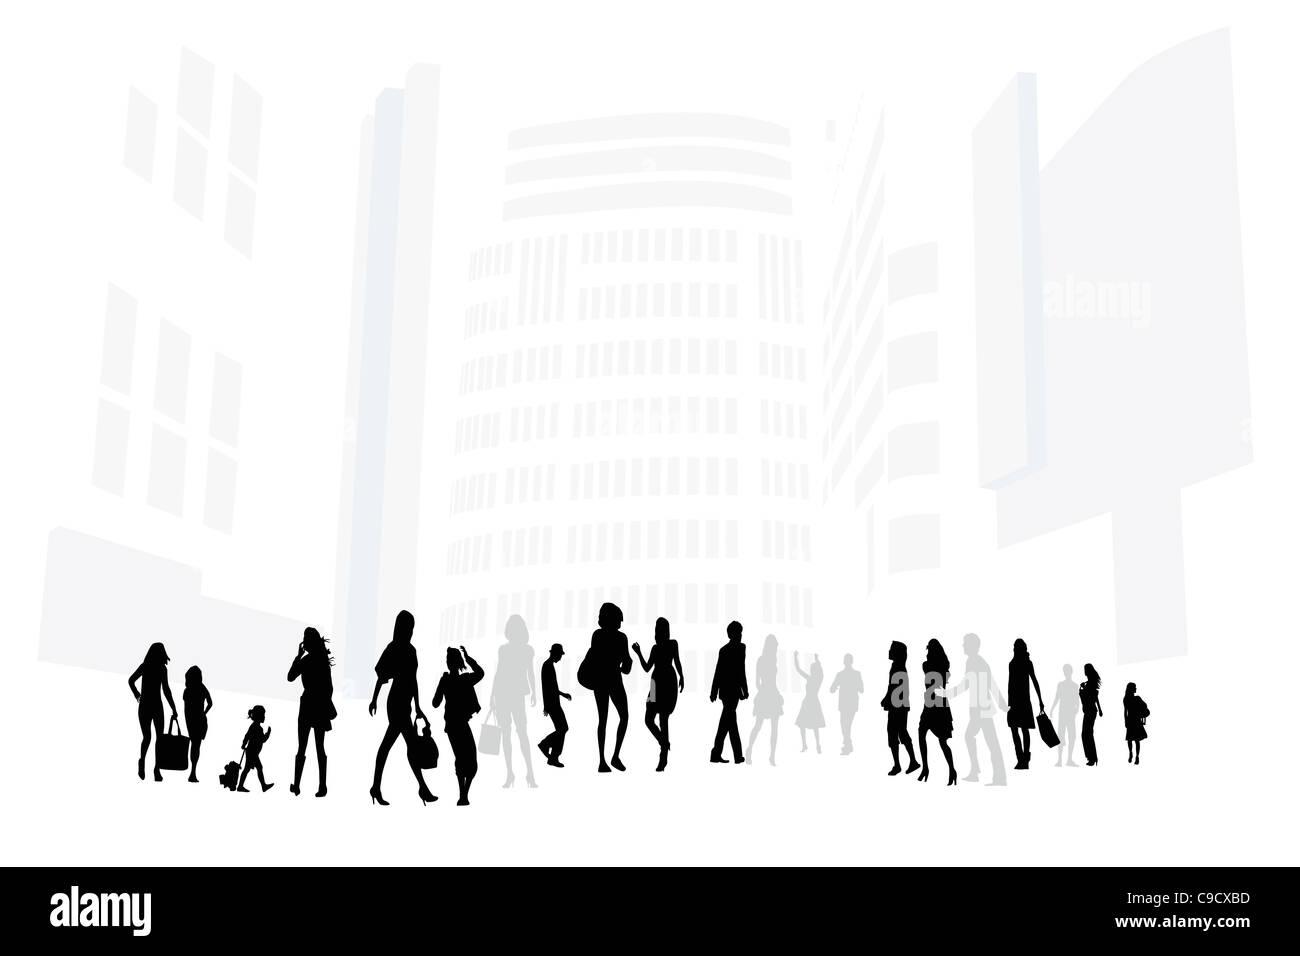 shopping street - Stock Image